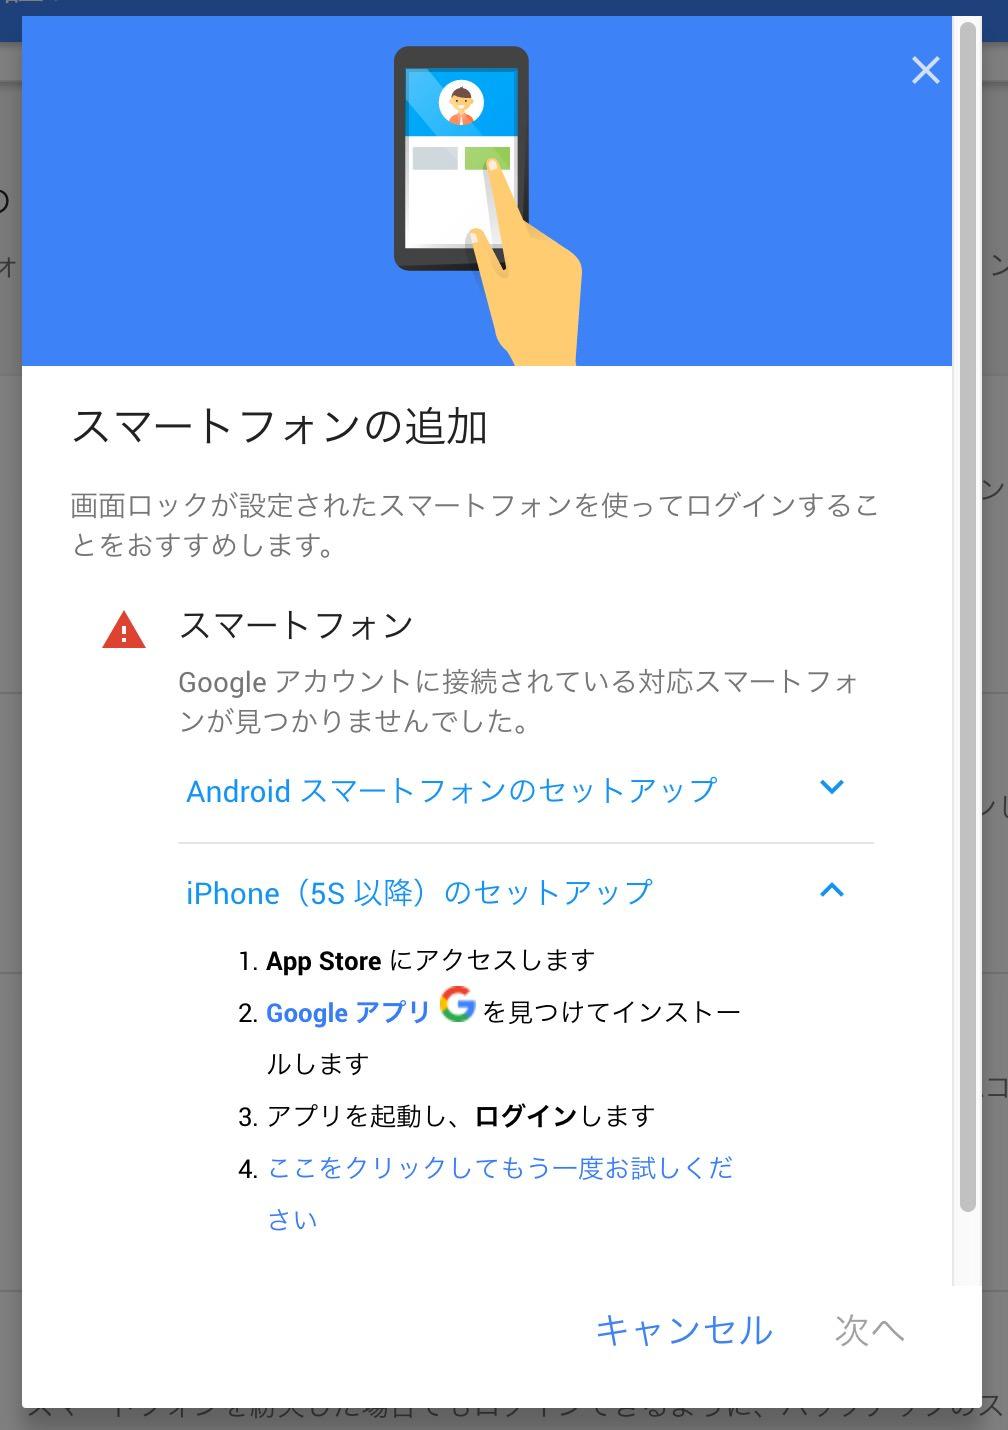 Google 06 23 1052 1